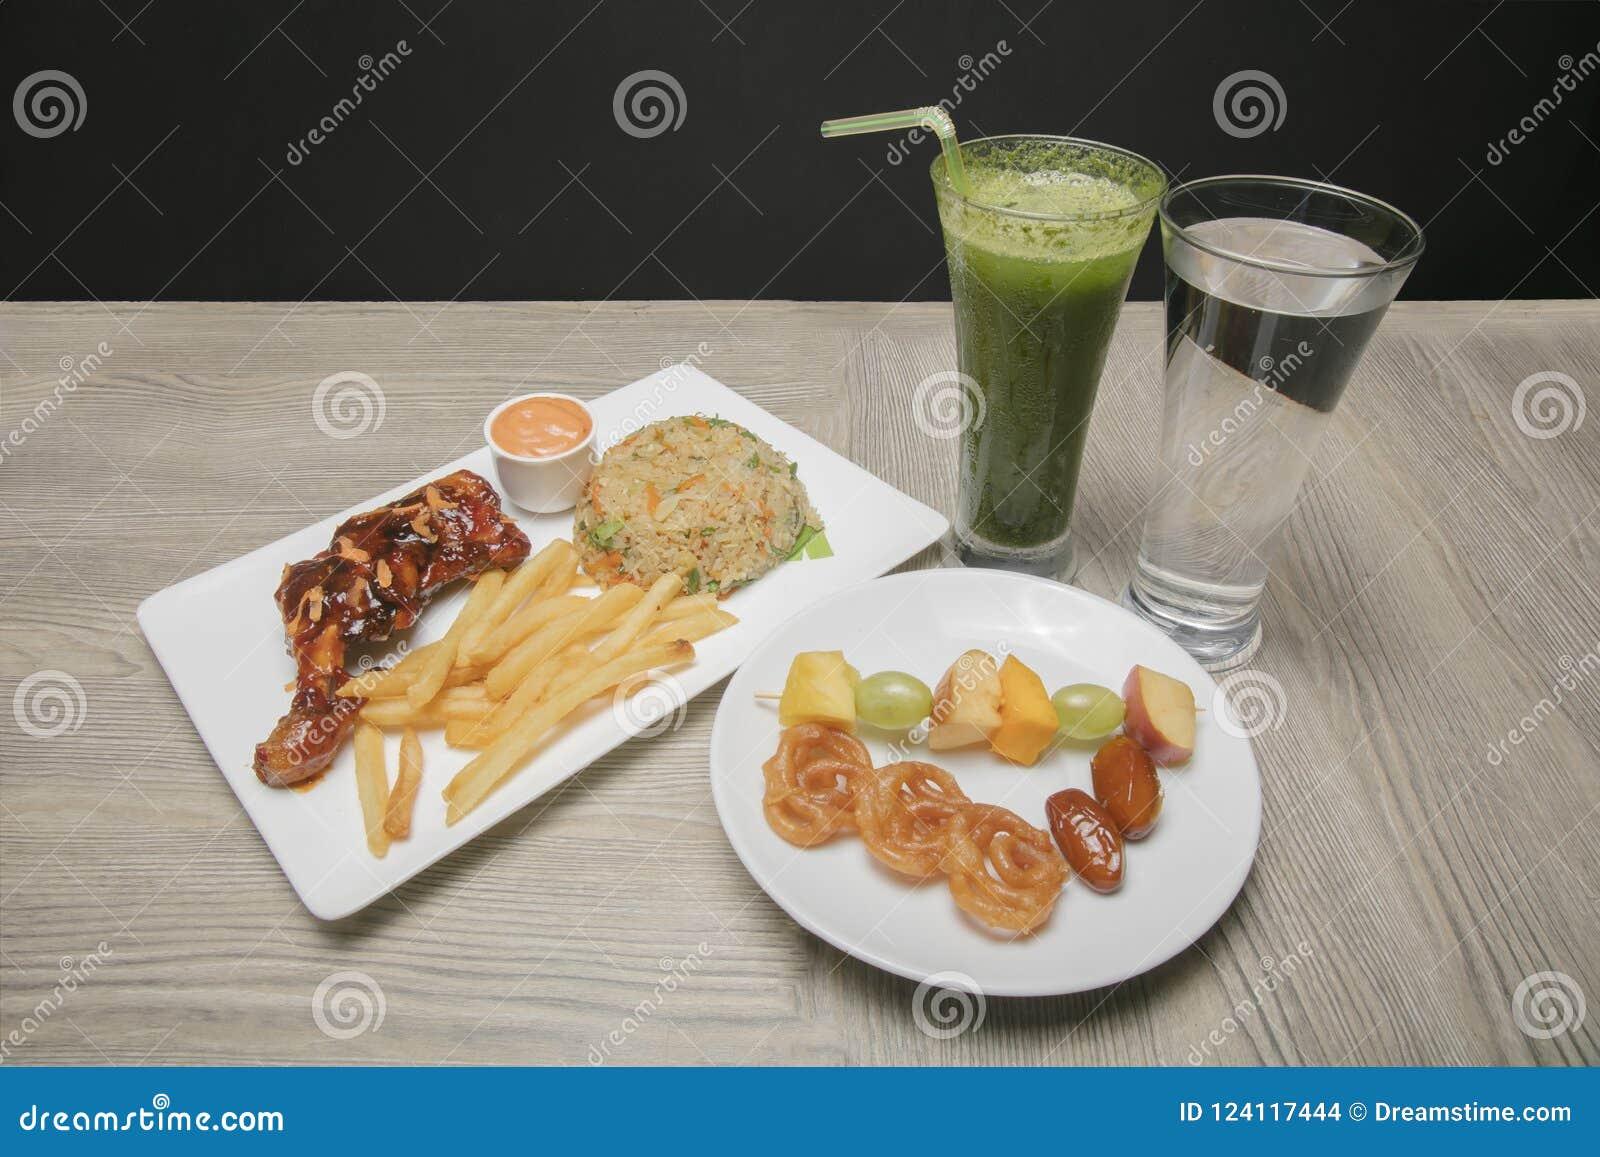 Iftar Food platter for Ramadan month